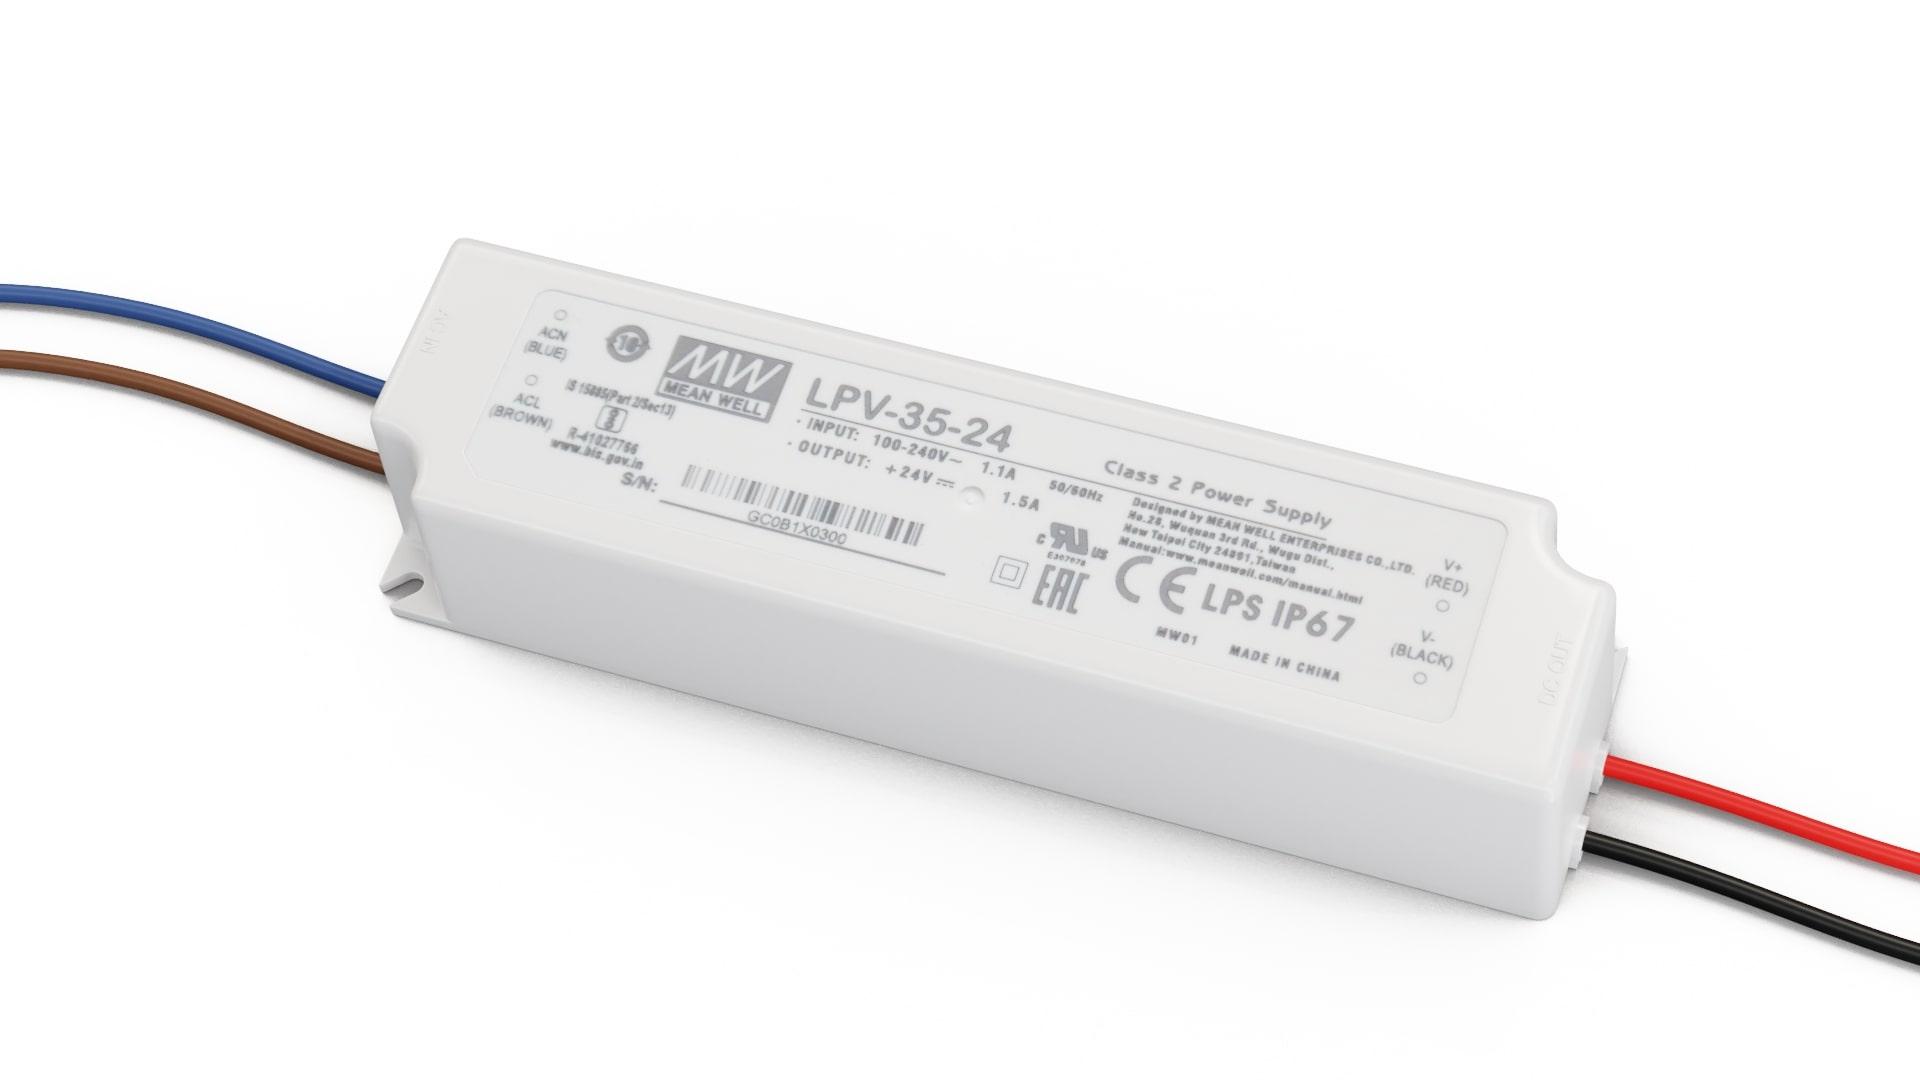 Zasilacz MEAN WELL LPV 24V 35W IP67